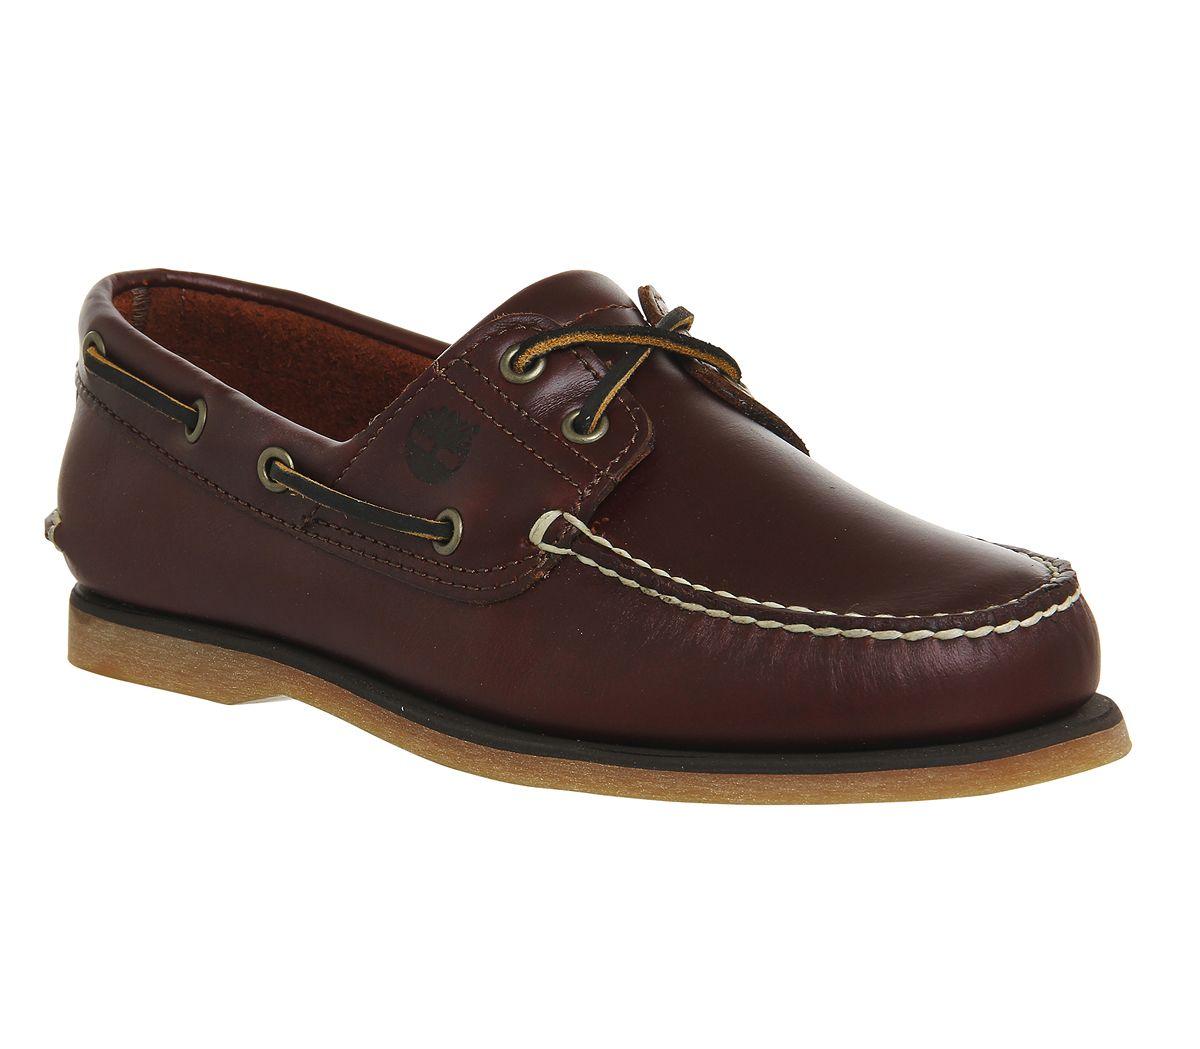 bcb12a96b547 SENTINEL Mens Timberland nuova barca scarpe Root Beer scarpe di cuoio casual